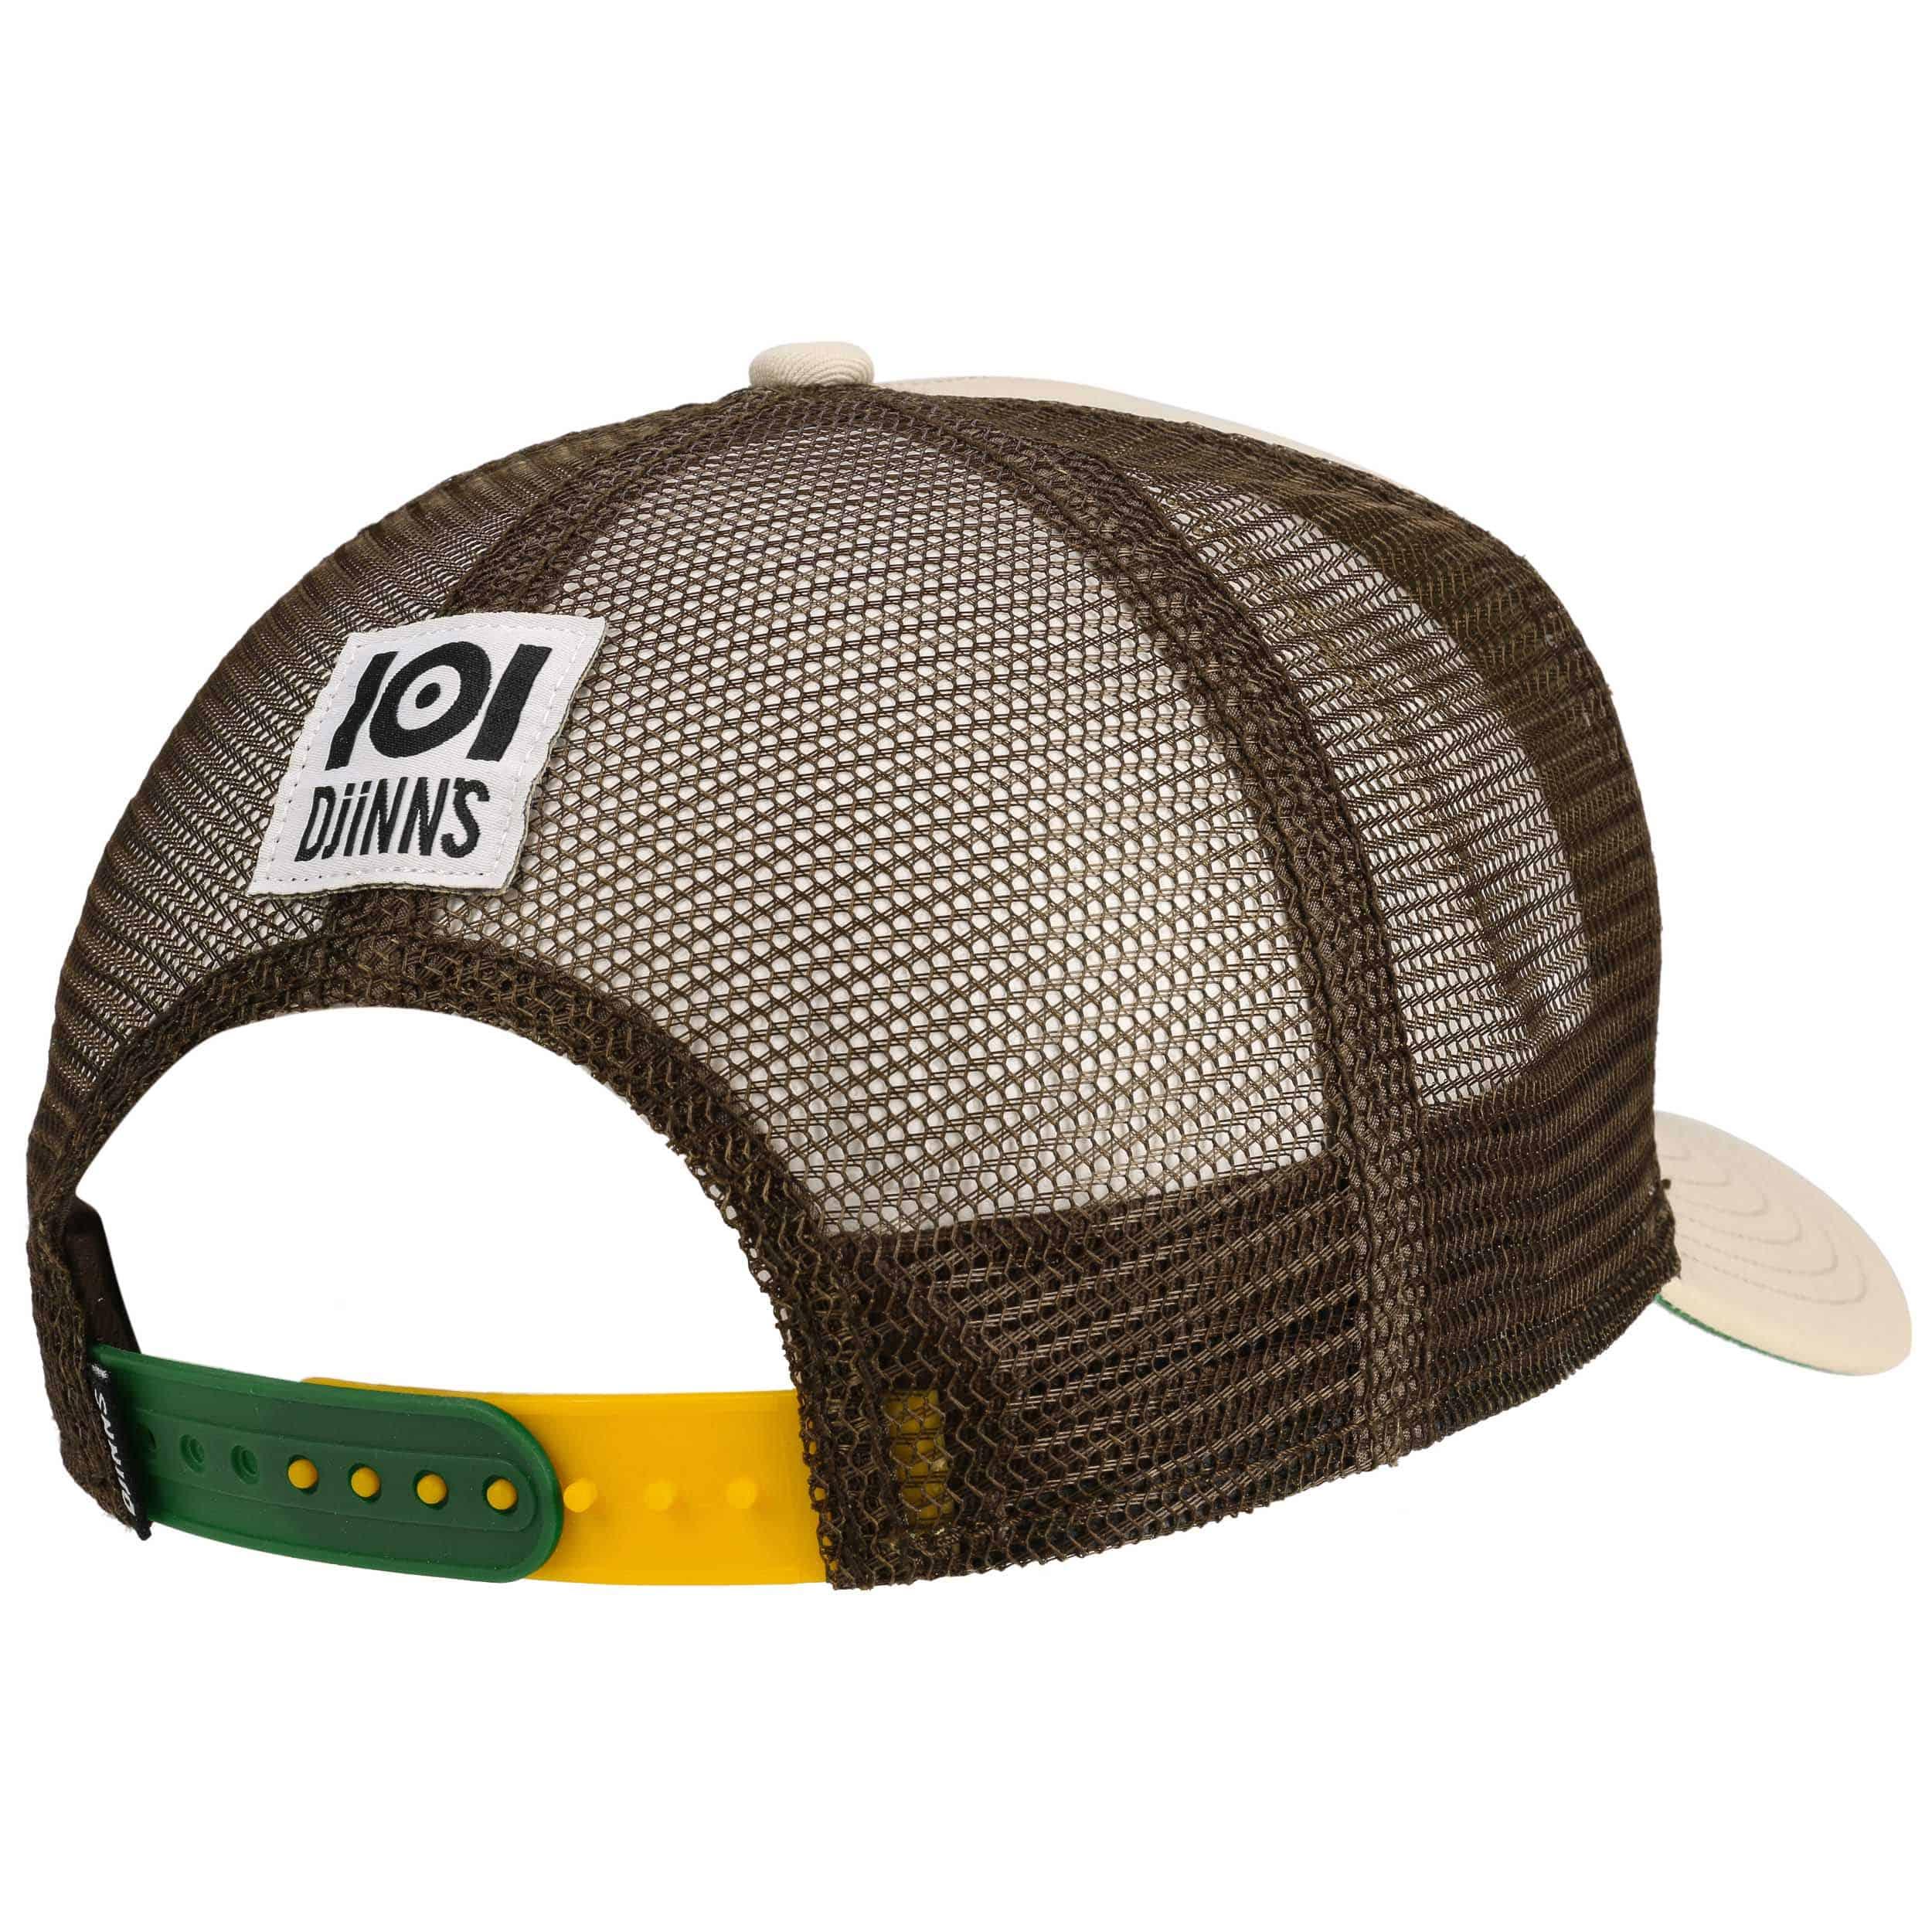 lagos hft 101 trucker cap by djinns gbp 22 95 hats. Black Bedroom Furniture Sets. Home Design Ideas